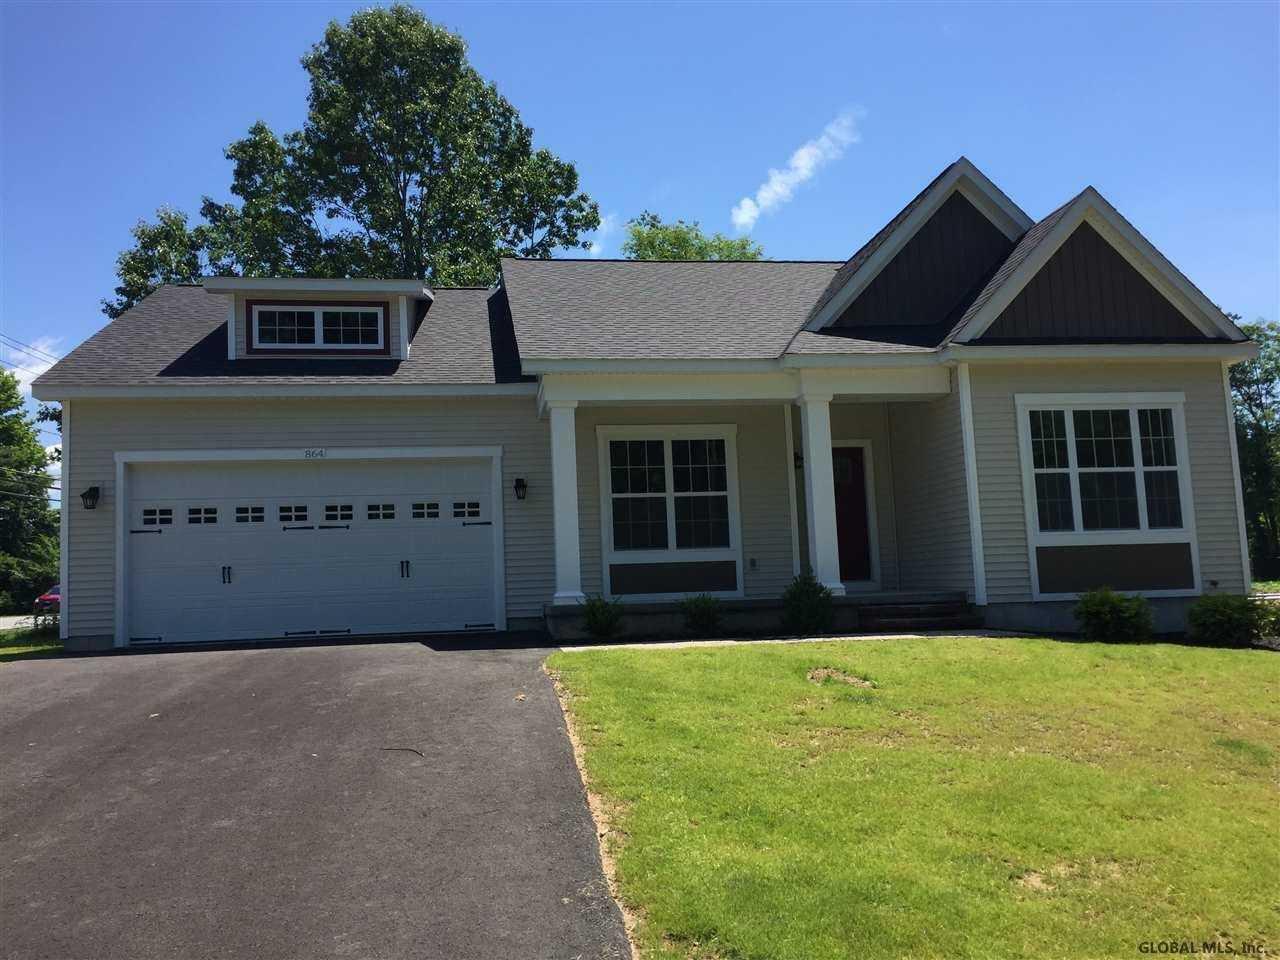 $367,900 - 3Br/2Ba -  for Sale in Wilton